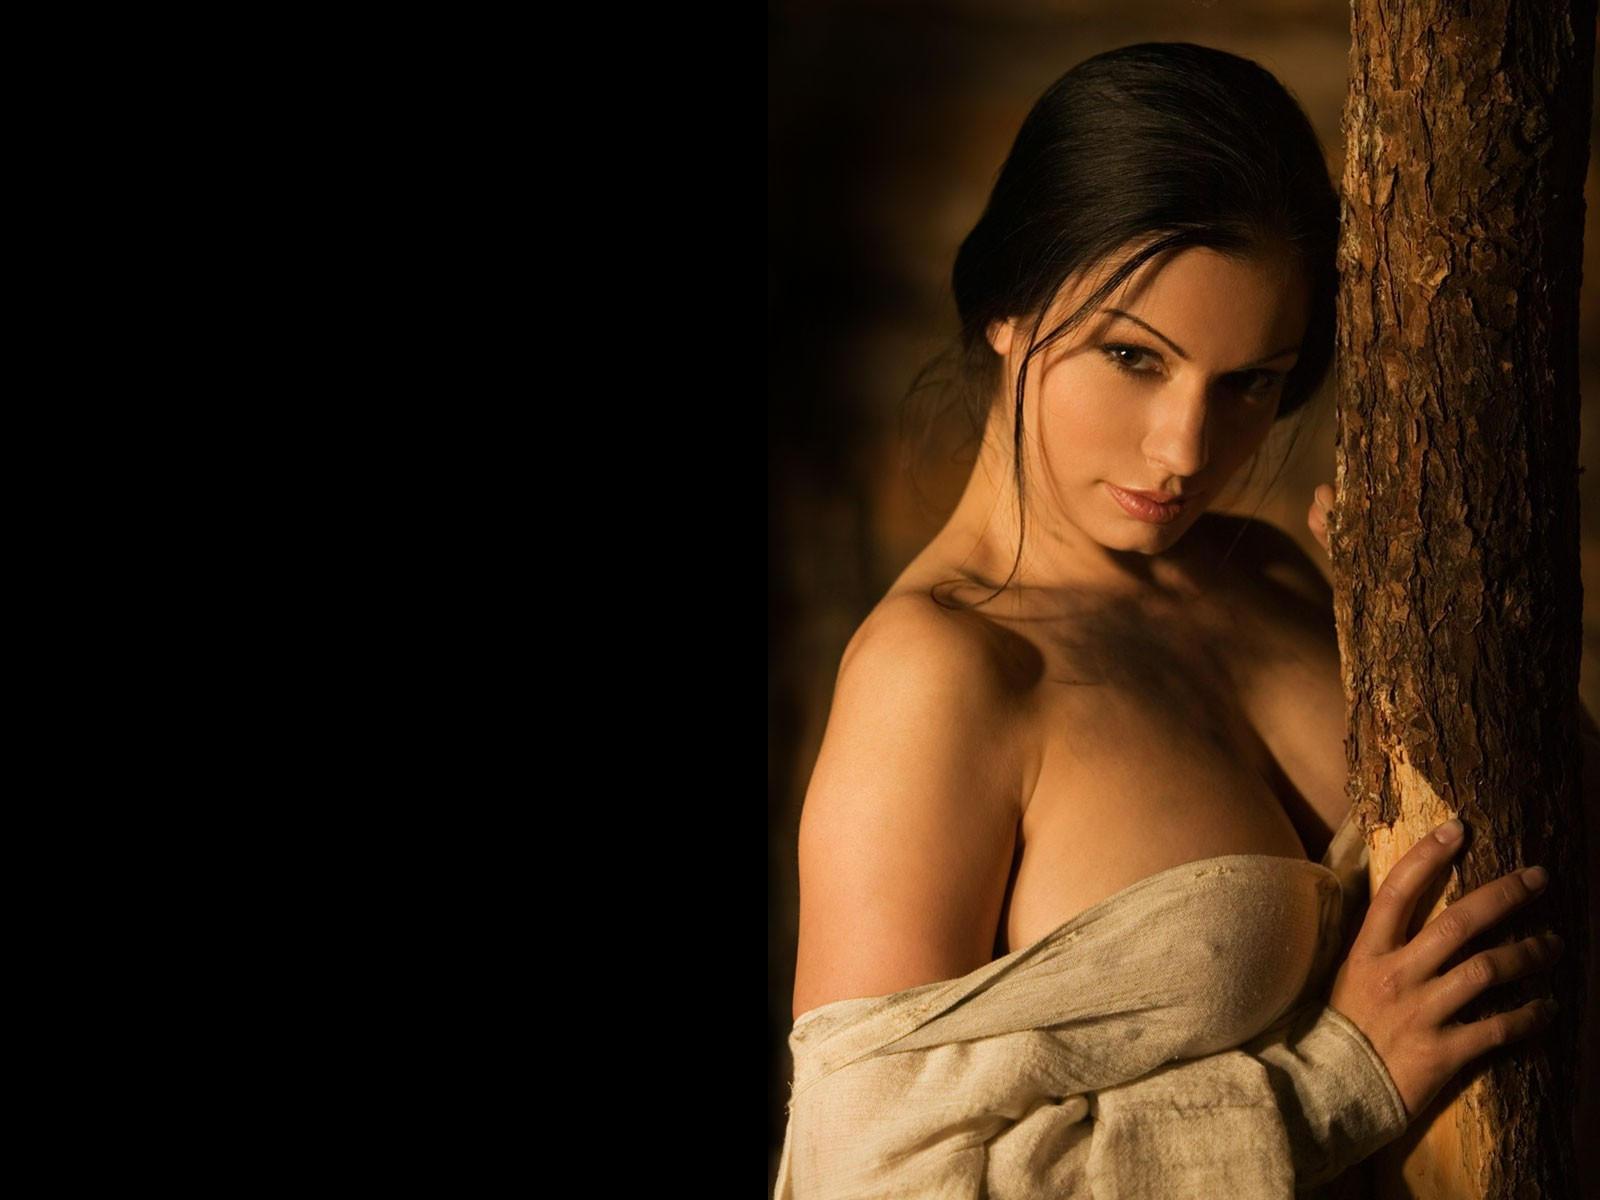 Яндекс картинки девушка руки валасатие бесплатно 26 фотография